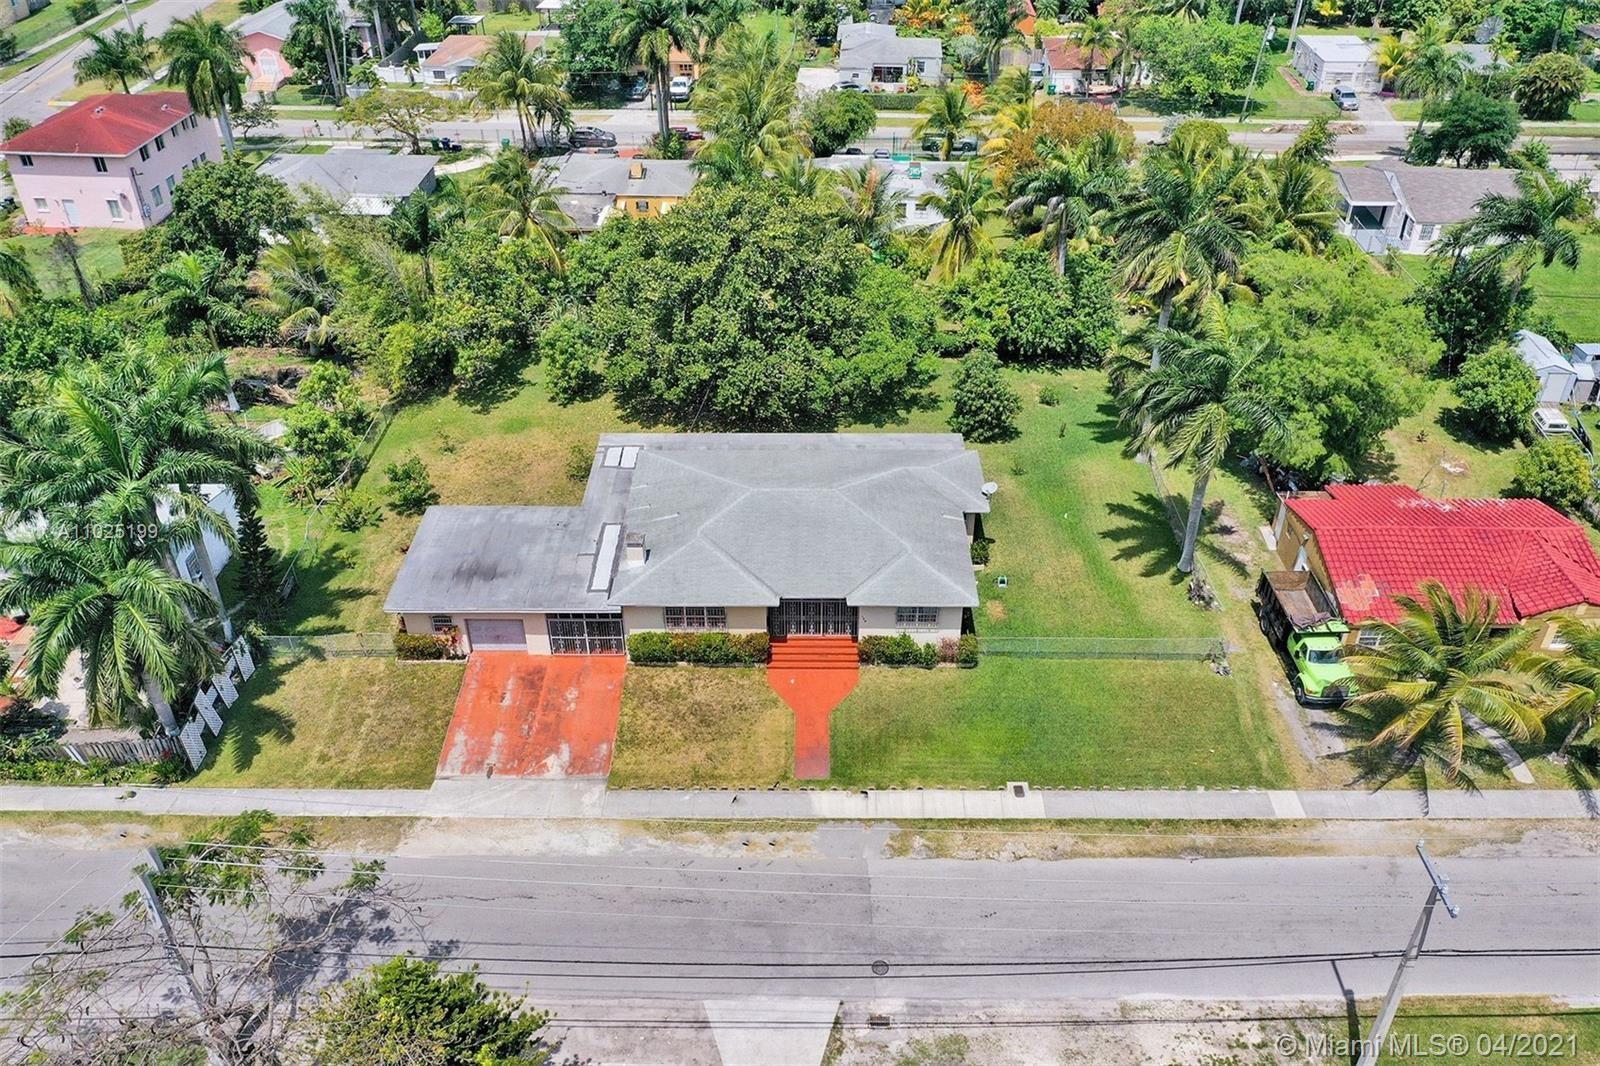 159 NW 83rd St, Miami, FL 33150 - #: A11025199